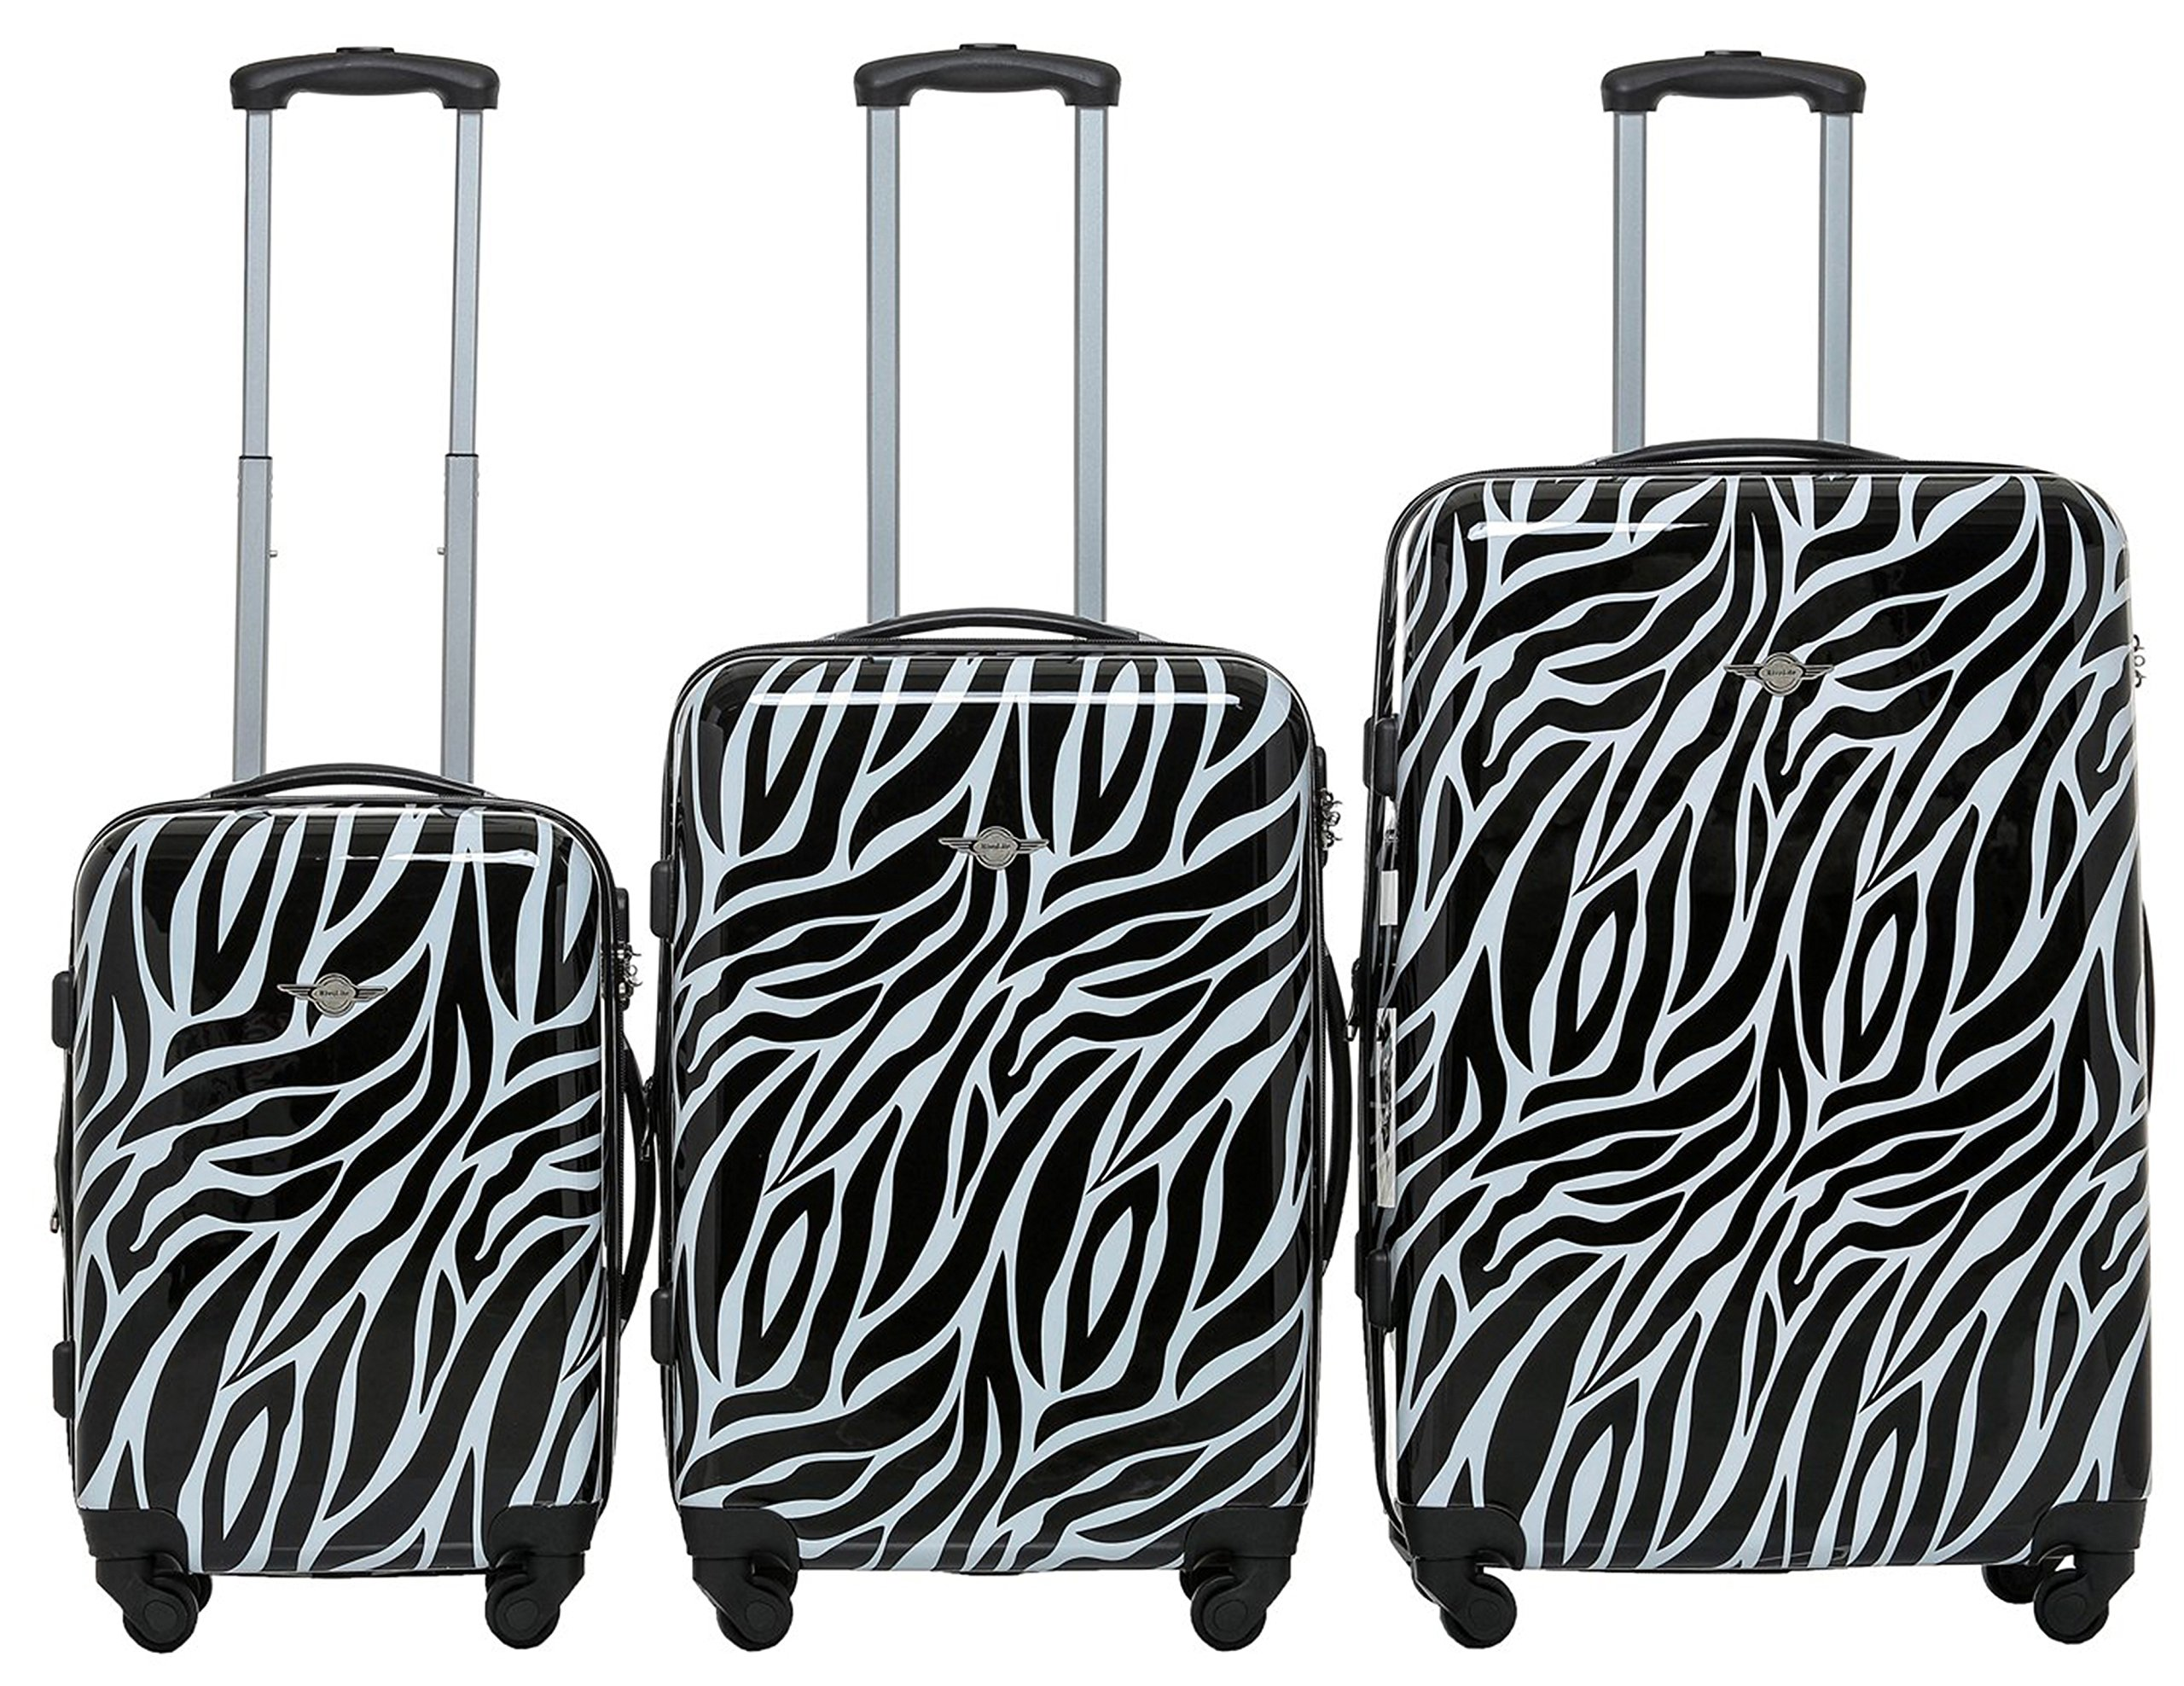 Rivolite PC 3 Piece Luggage Set: 20'' 24'' 28'' Portable Suitcase Zebra Unique Design The Pringting Design Luggage(Zebra) by Rivolite